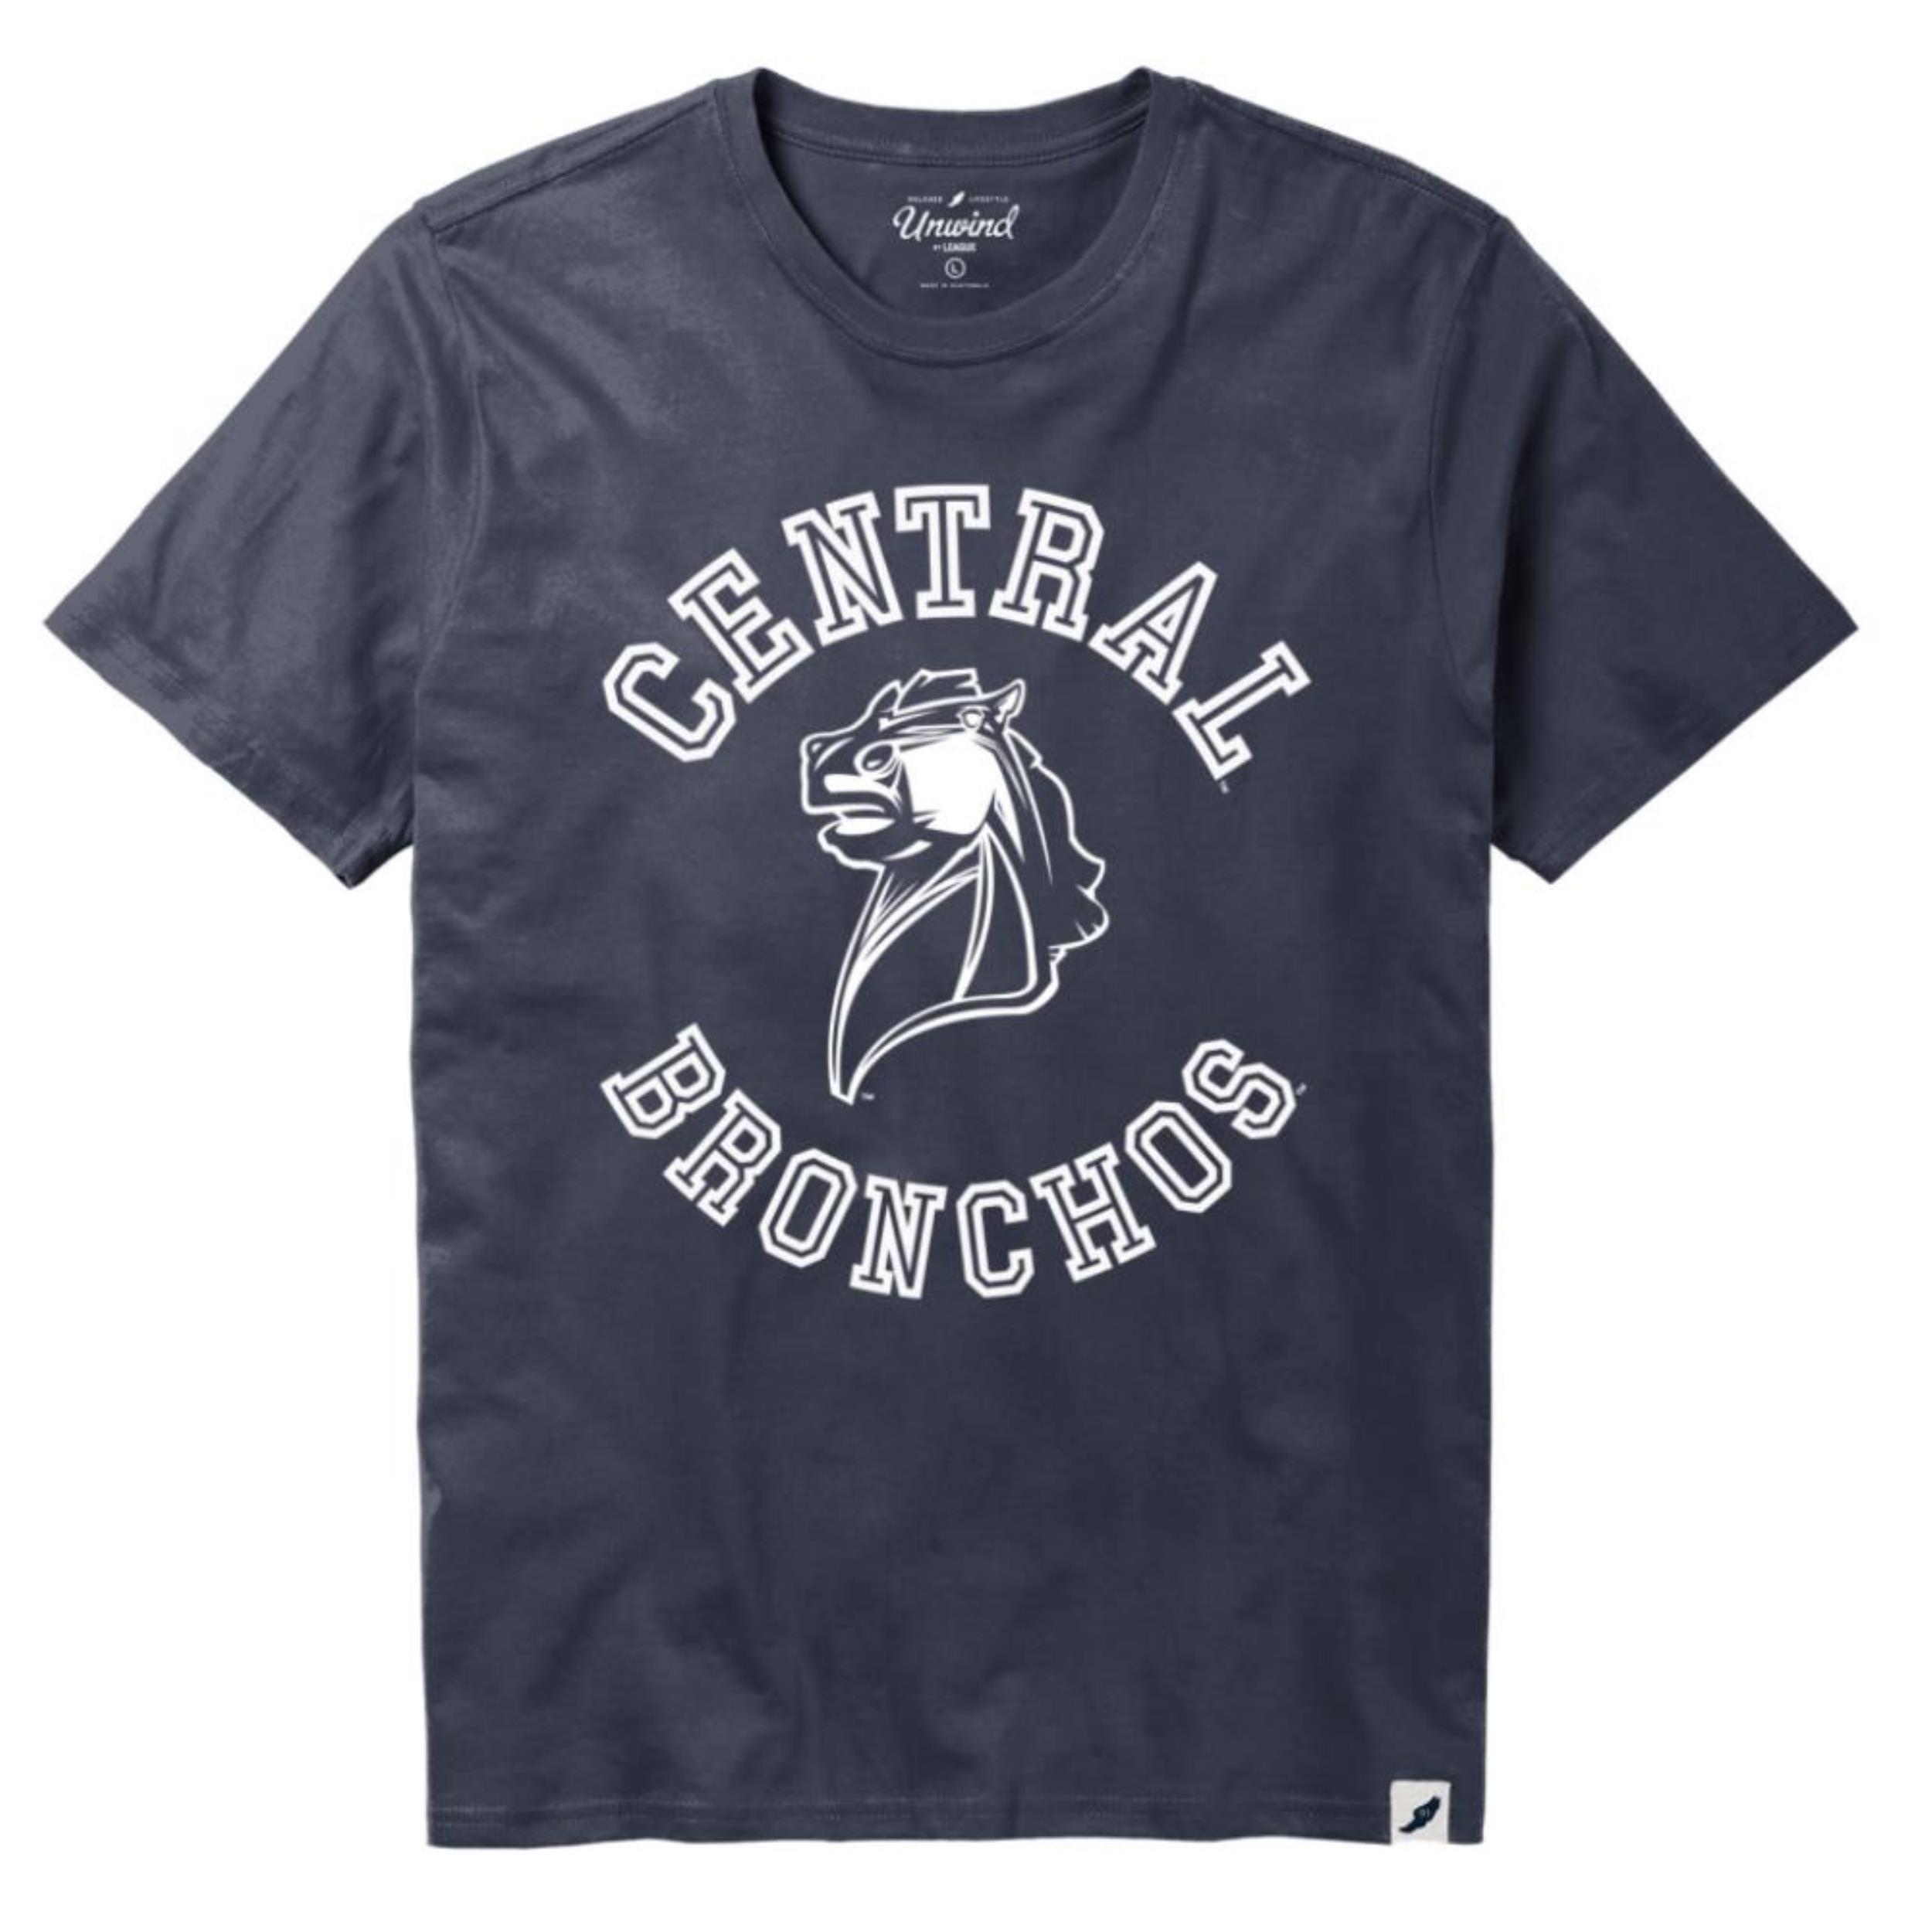 Central Bronchos Super Tee